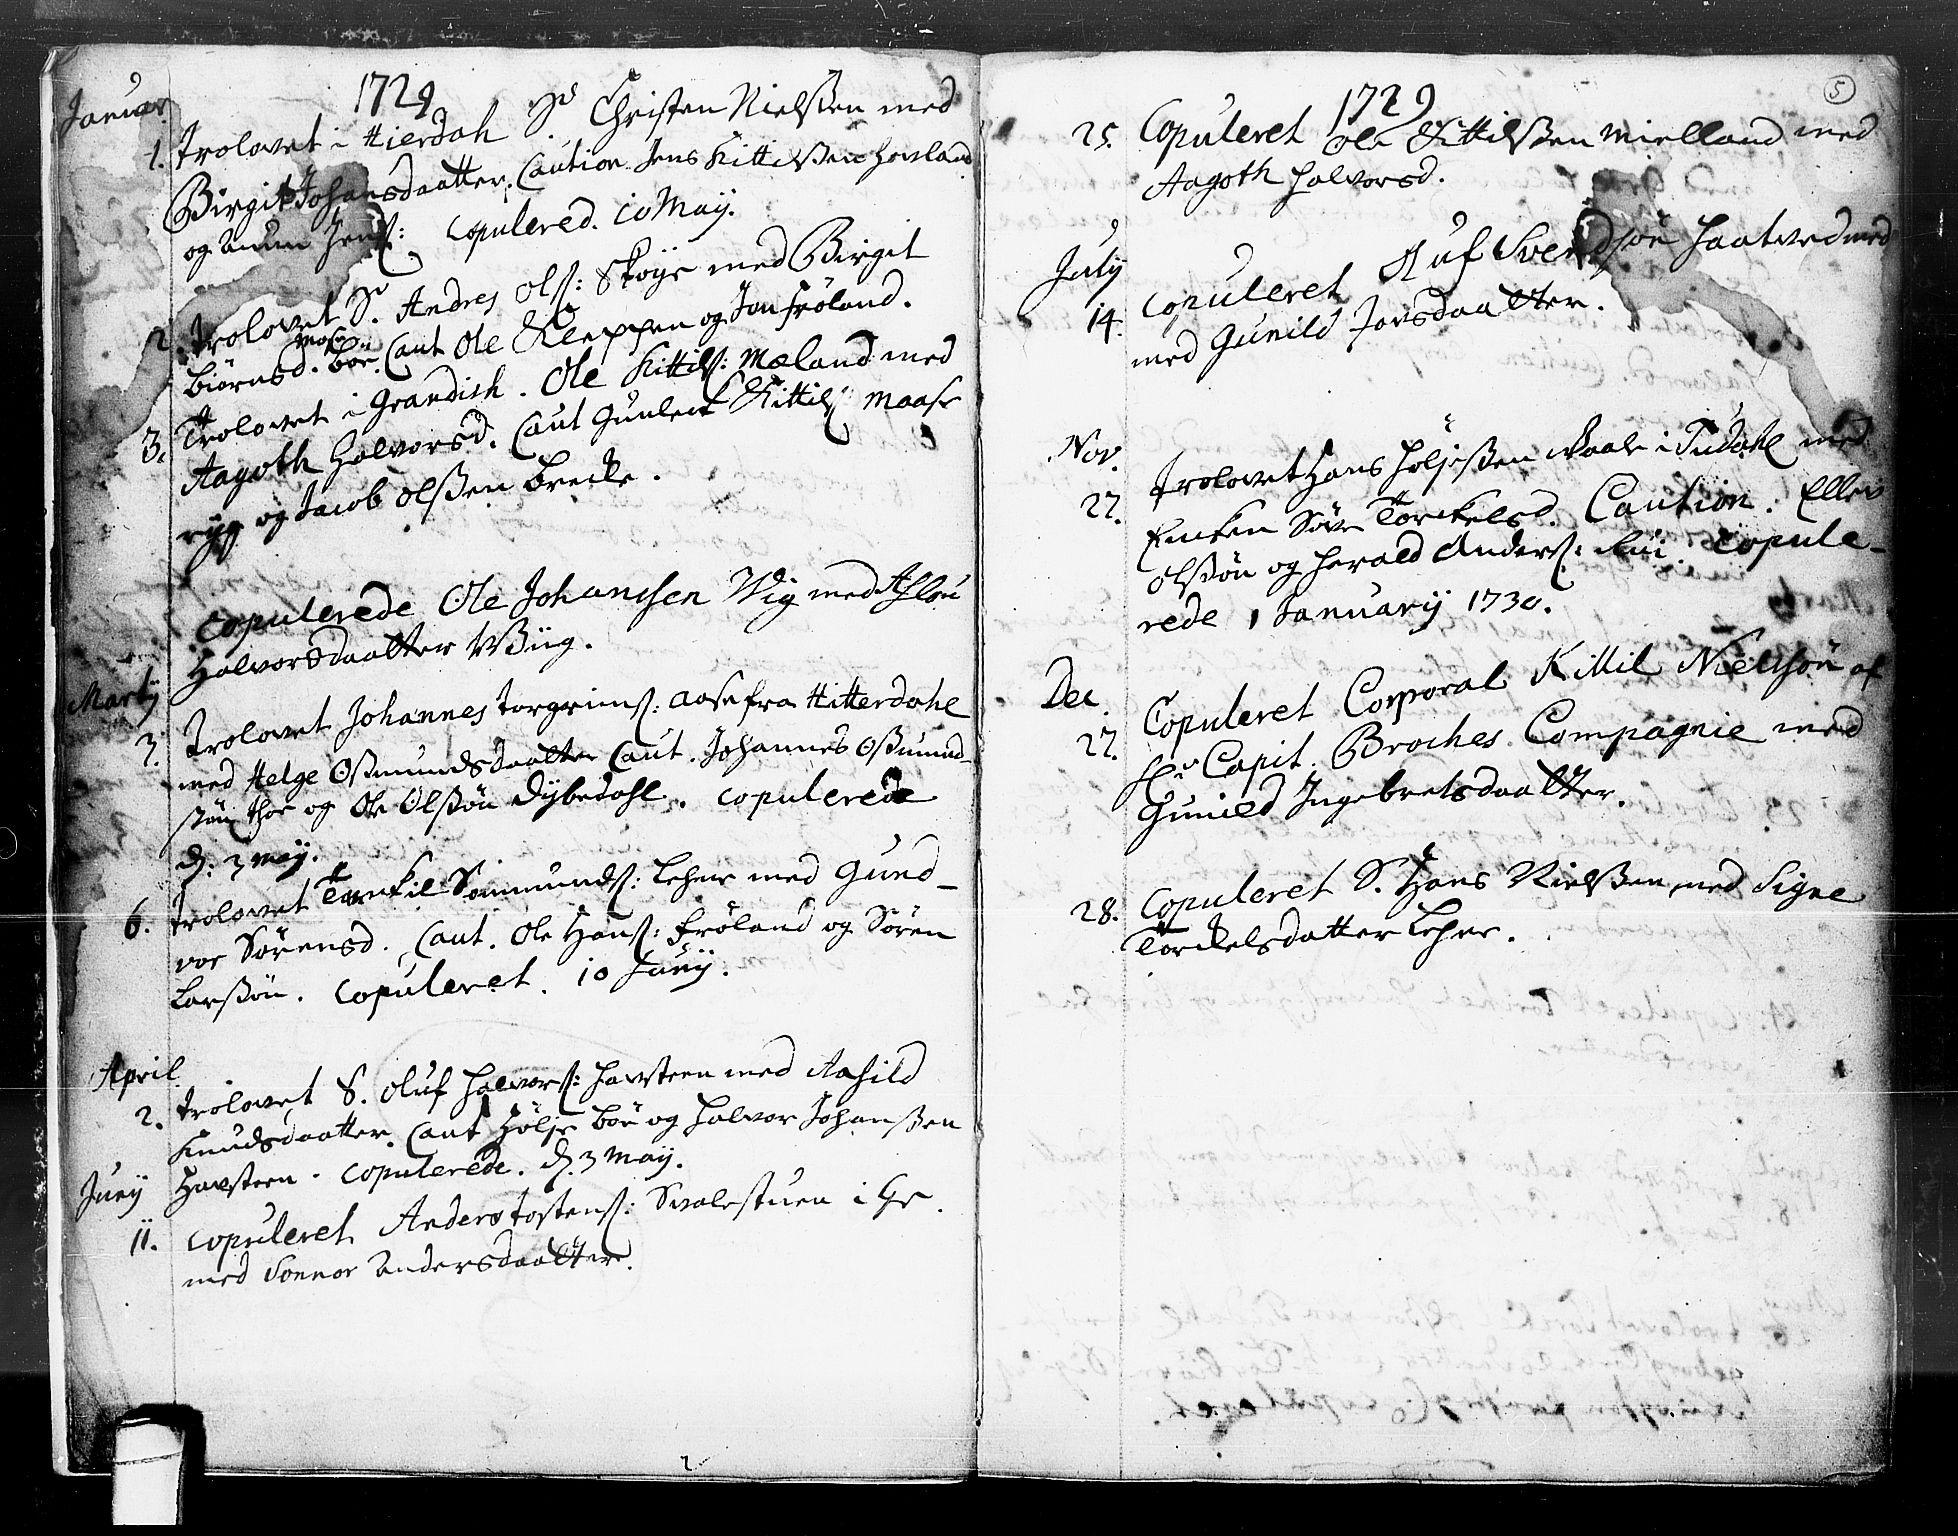 SAKO, Hjartdal kirkebøker, F/Fa/L0004: Ministerialbok nr. I 4, 1727-1795, s. 5